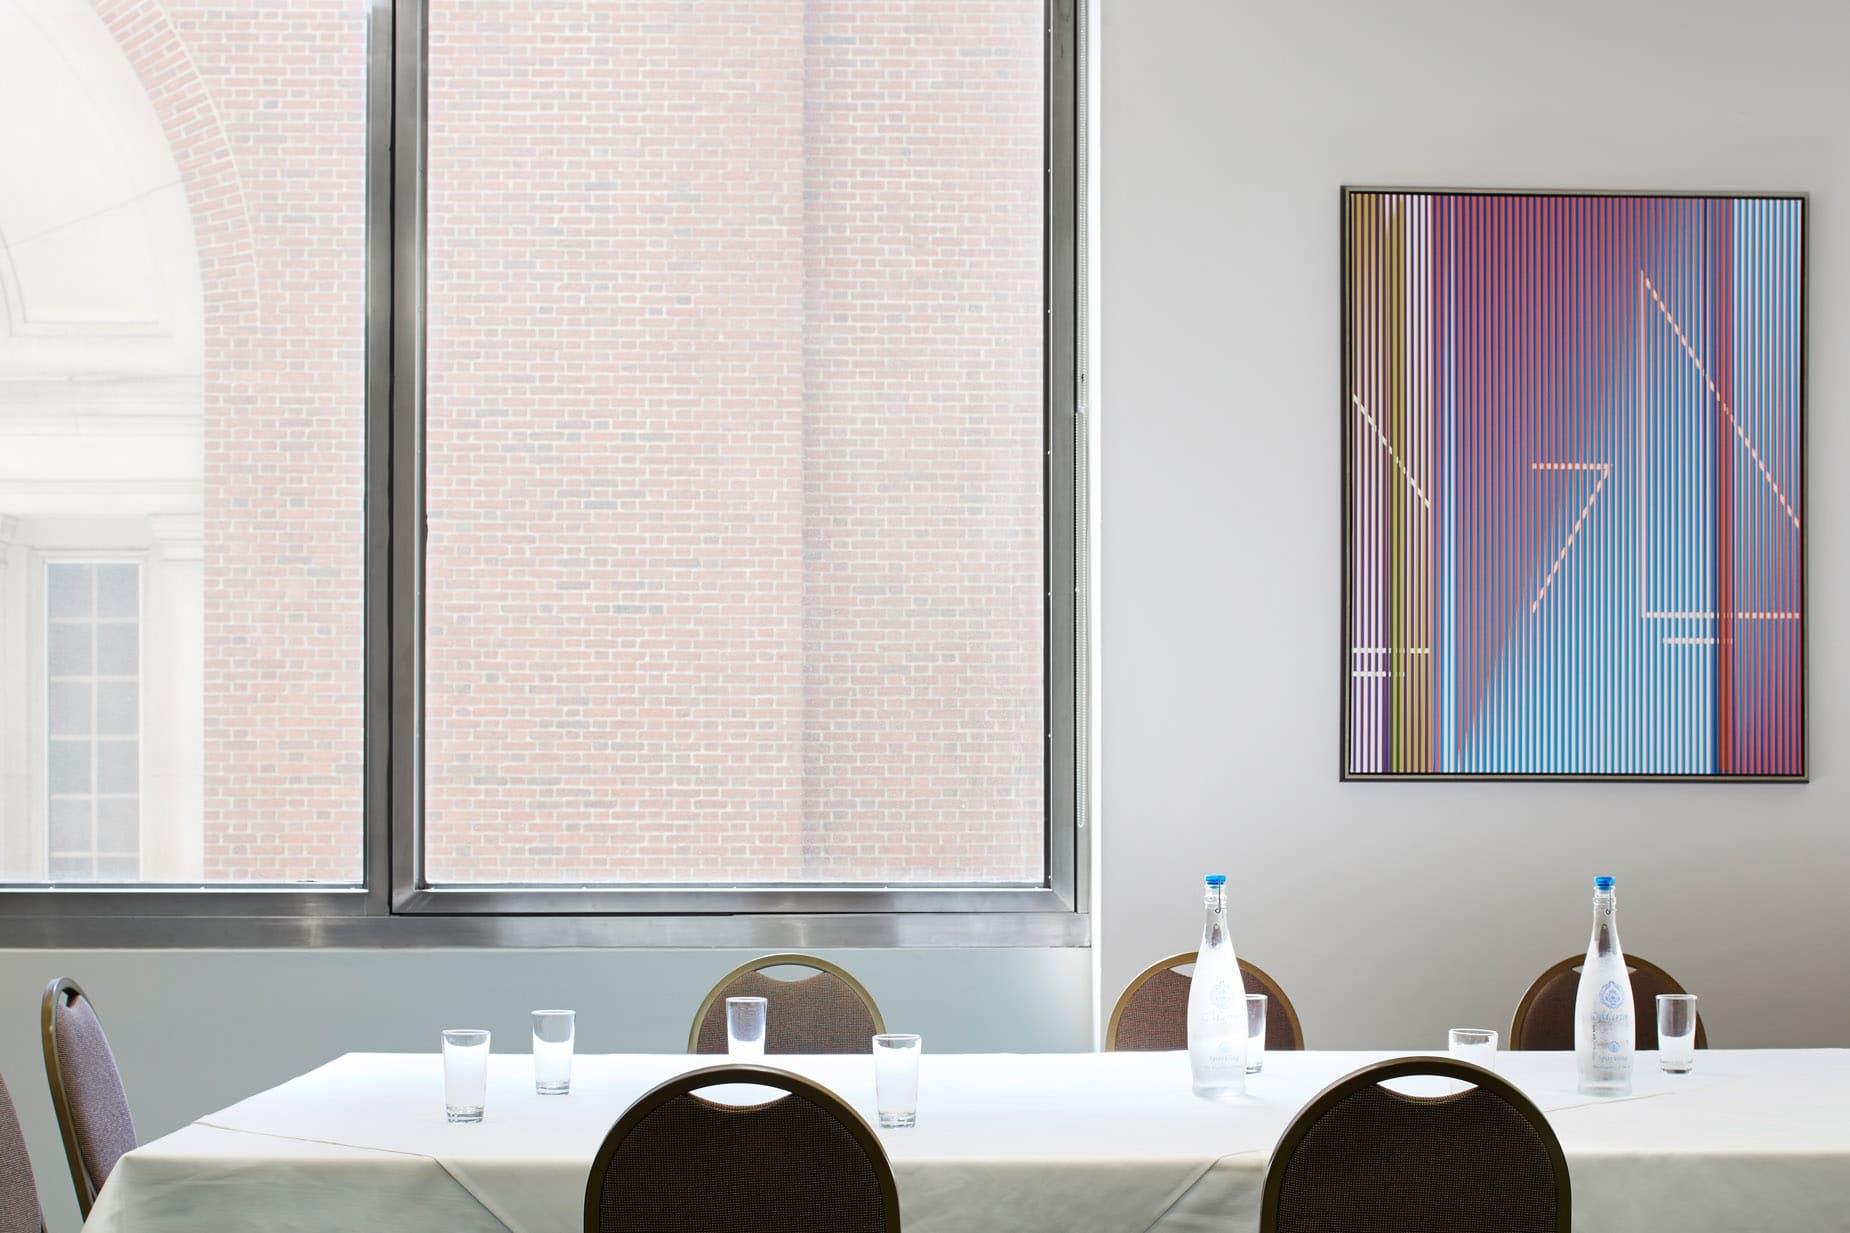 Meeting Room at Club Quarters Hotel, Wall Street